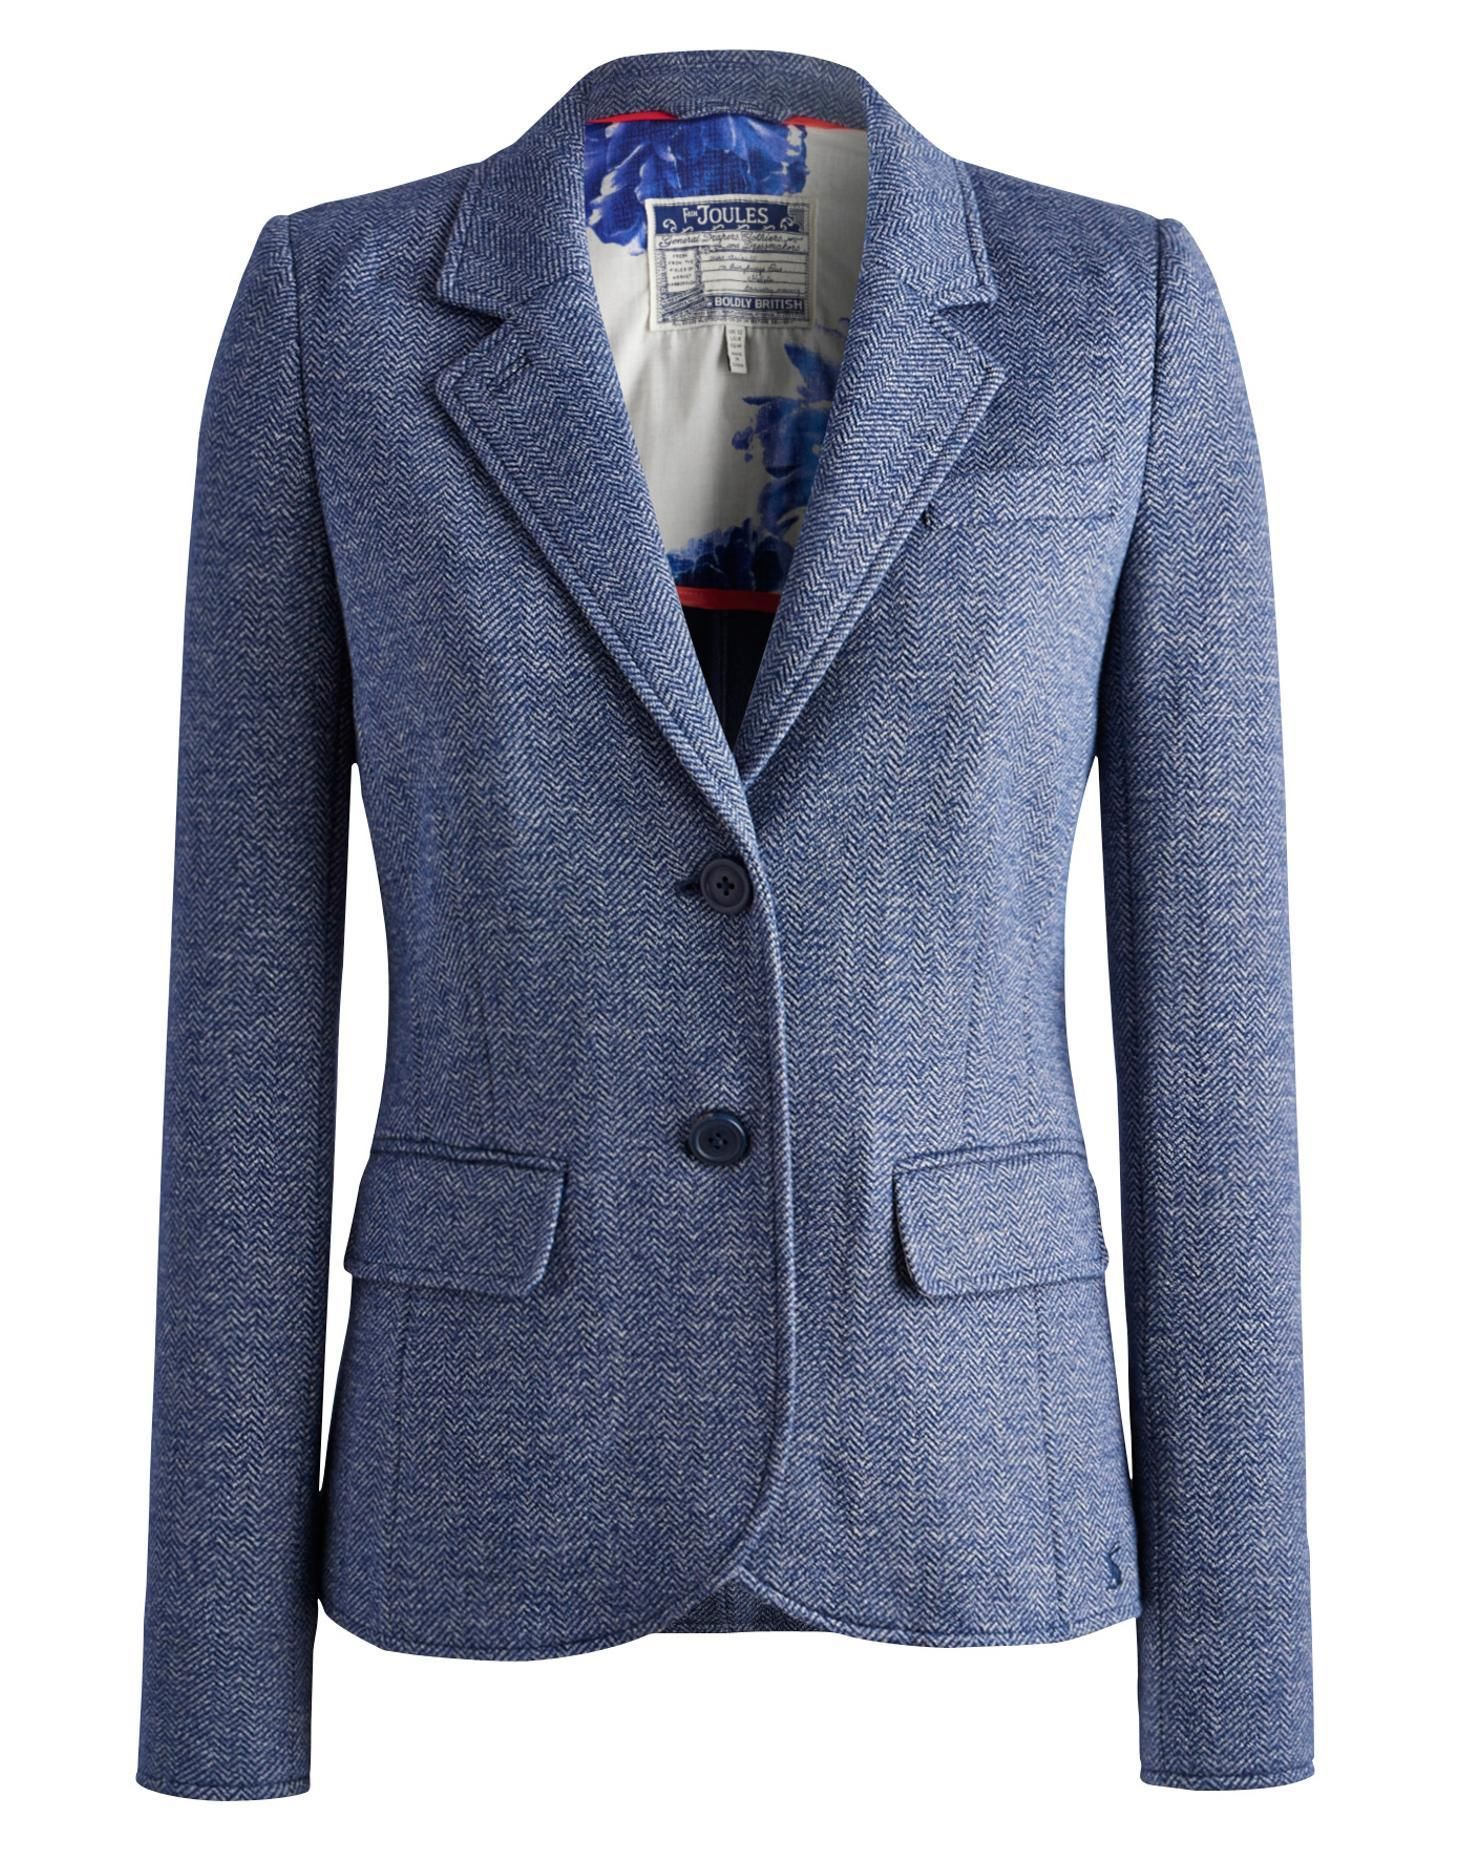 HENFORD Womens Jersey Tweed Blazer | Coats, Jackets & Blazers ...